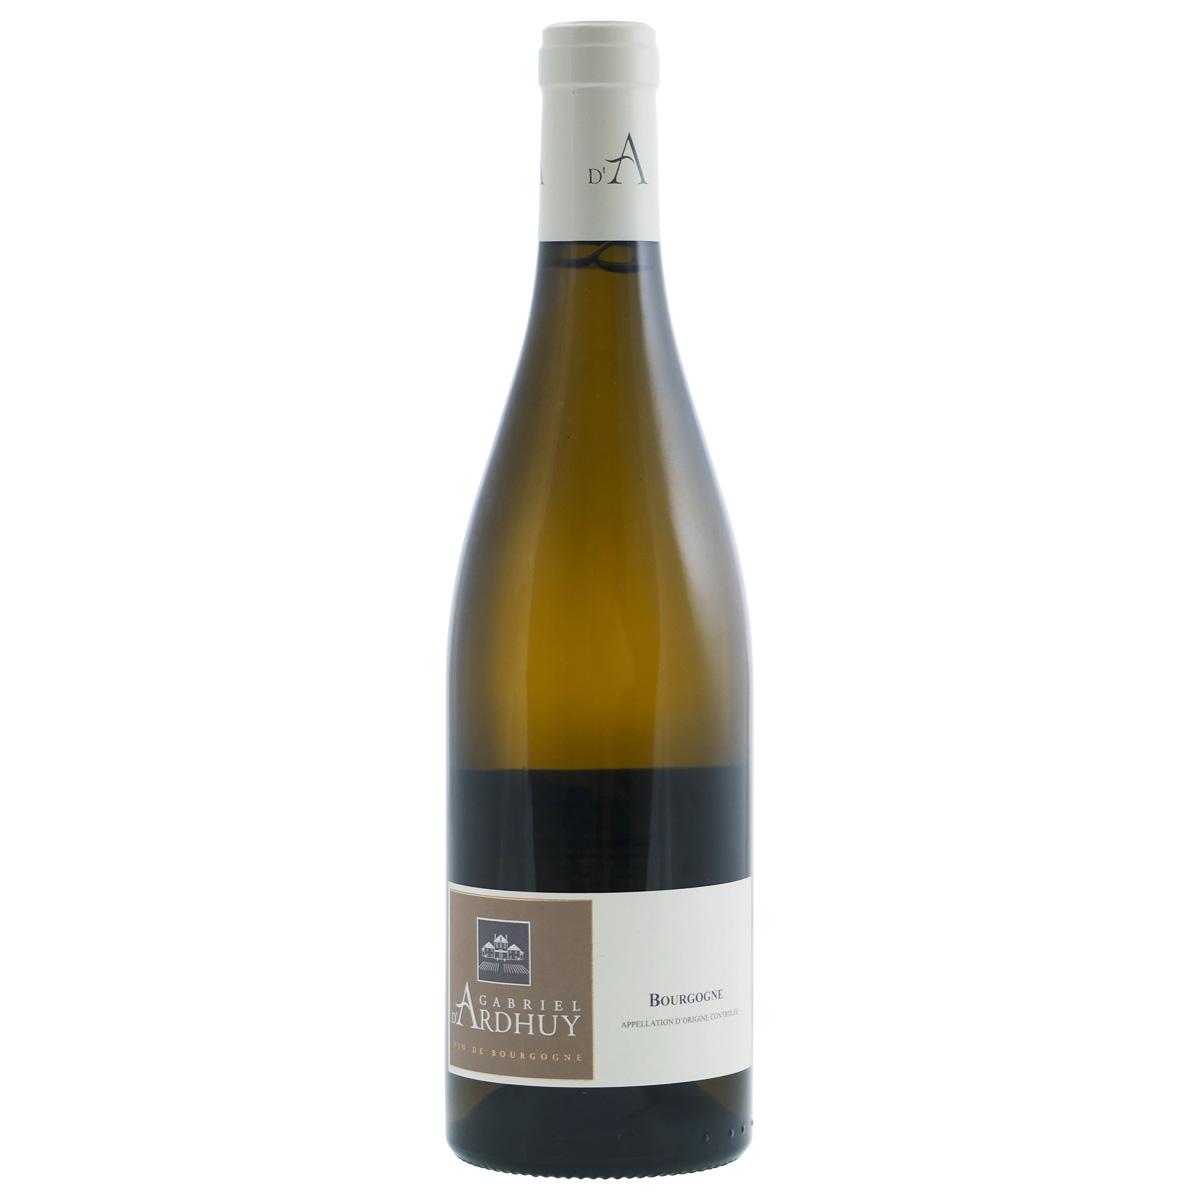 Bourgogne Chardonnay - Domaine d\'Ardhuy - 2018 - BIO